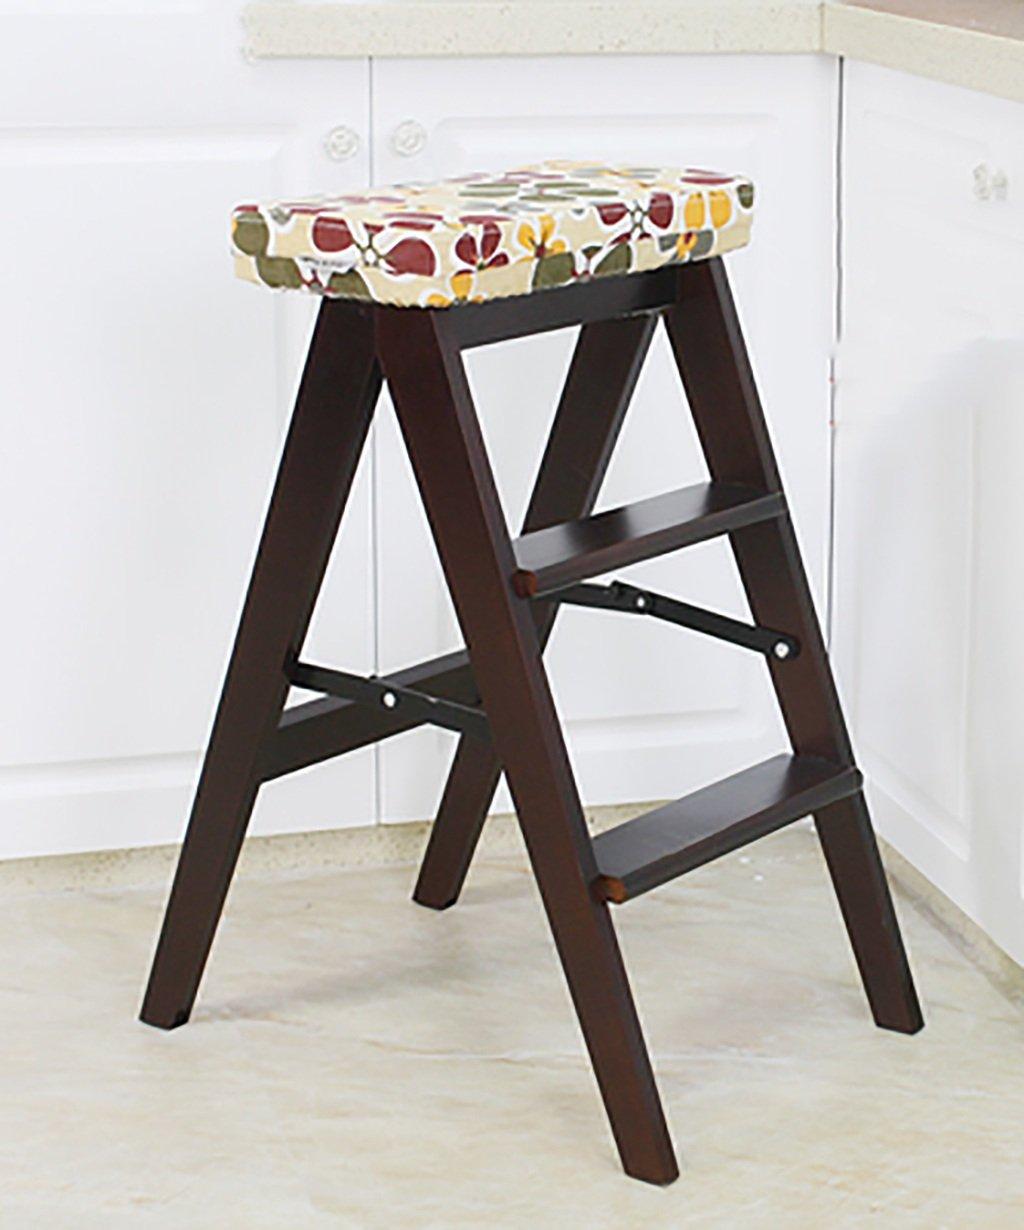 Amazon.de: Massivholz Stuhl Leiter Home Multifunktion Küchenhocker ...